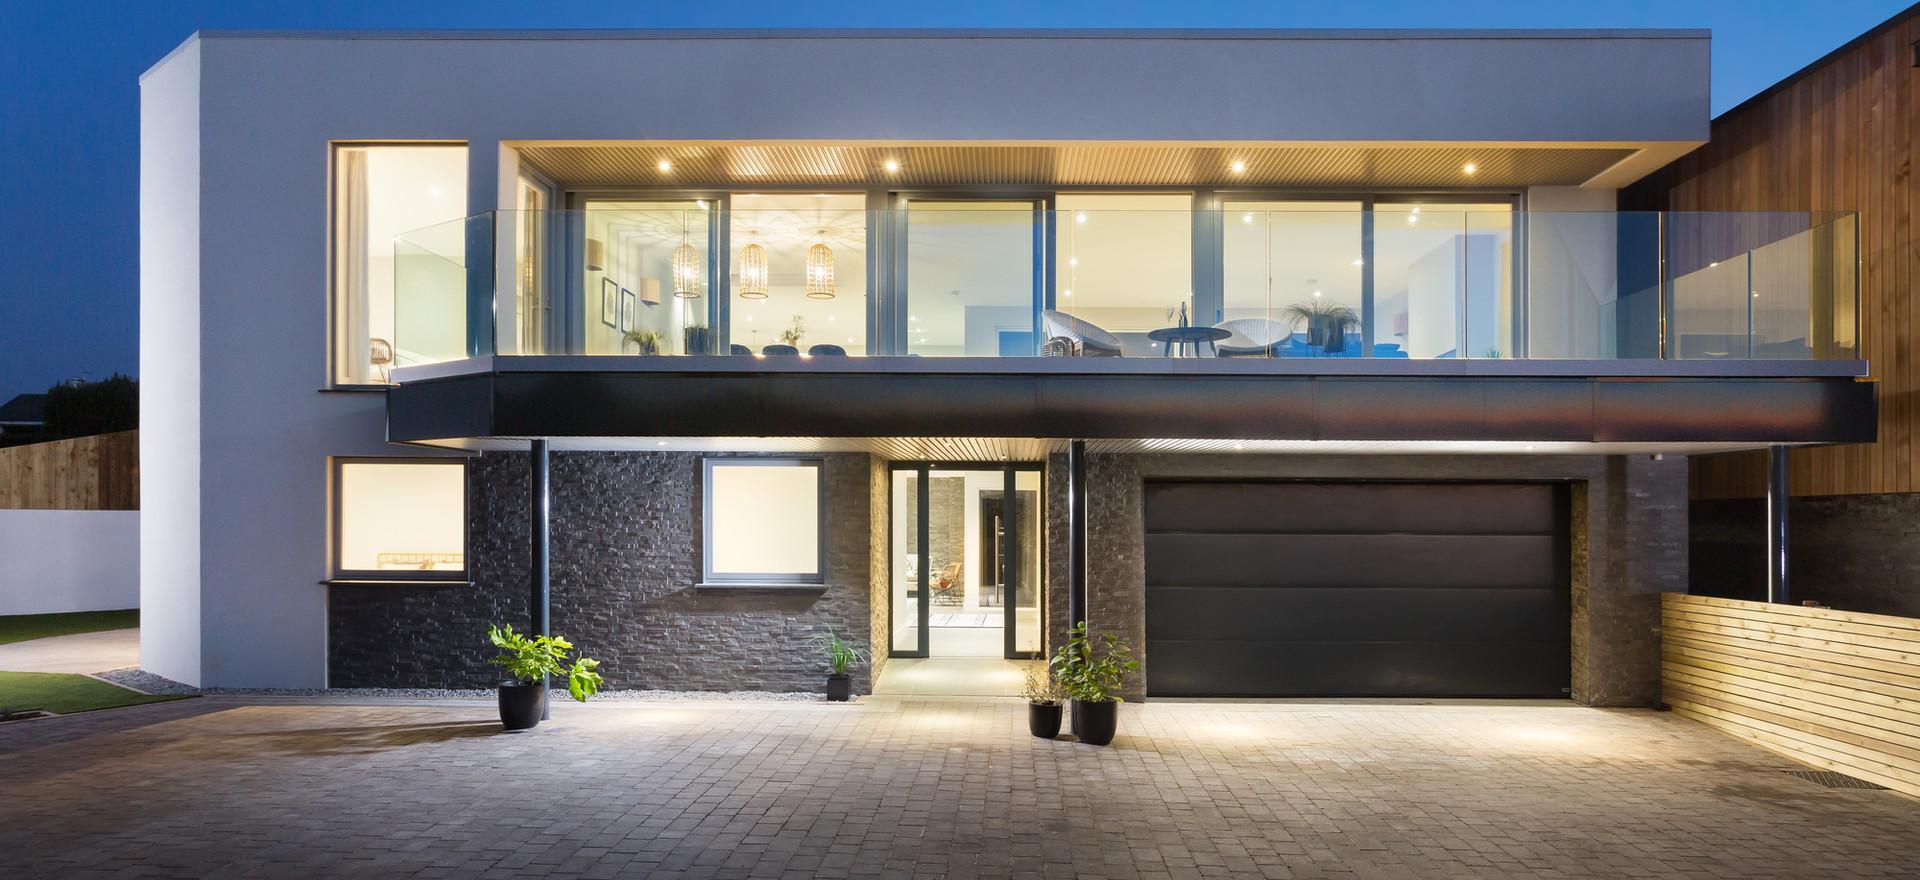 New dwelling, Polzeath